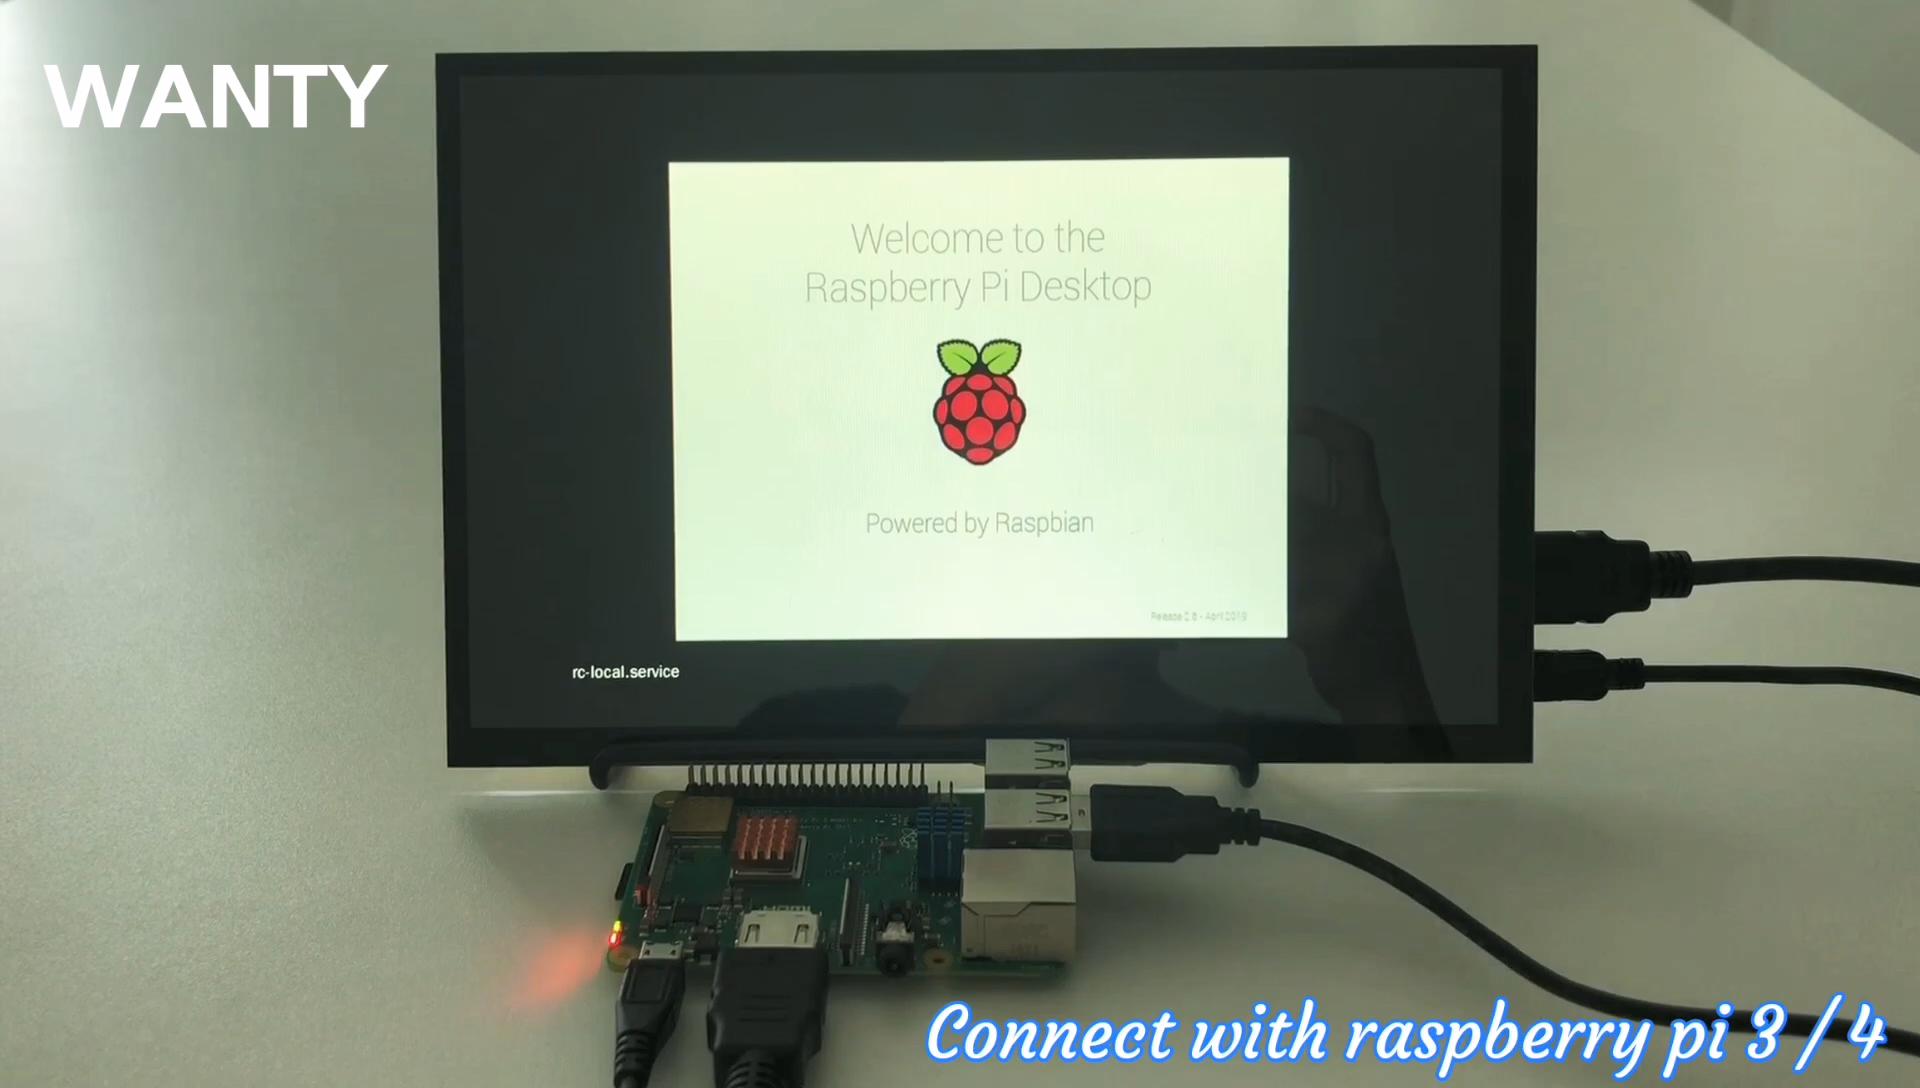 Custom Size 10.1 Inch 1280x800 IPS Screen TFT Panel USB Touch Display Raspberry Pi 3 Monitor